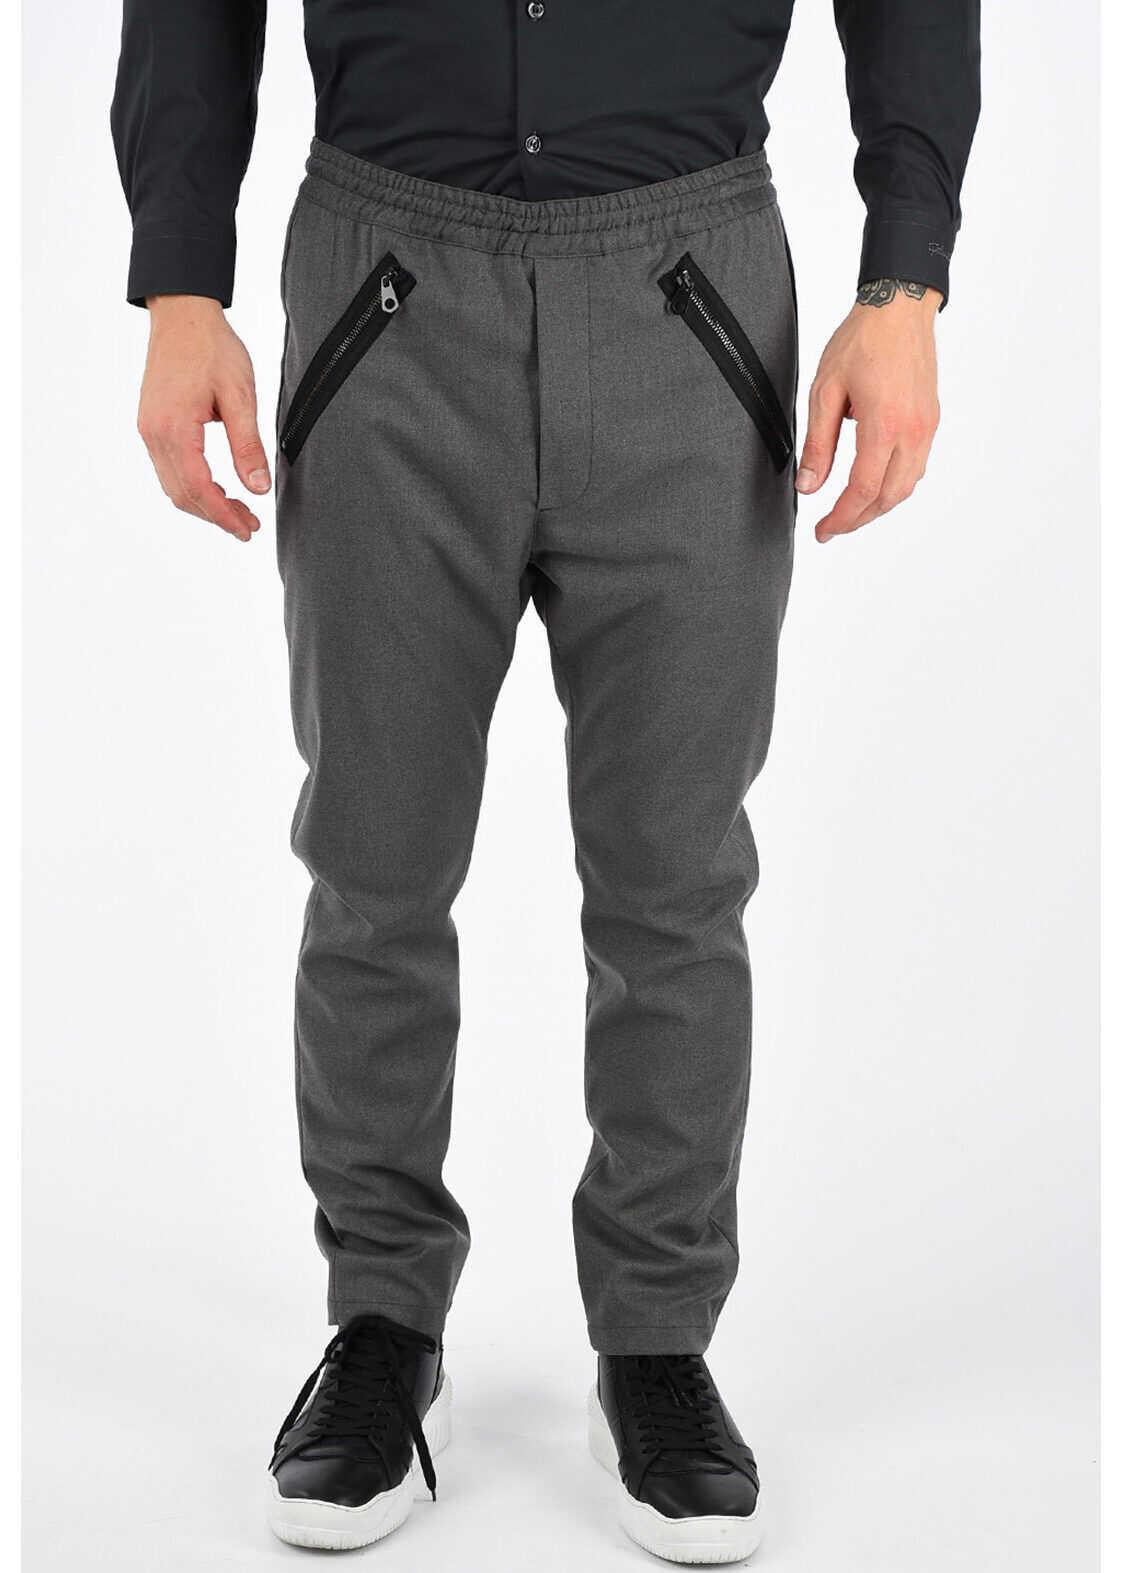 Just Cavalli Straight Leg Pants DARK GRAY